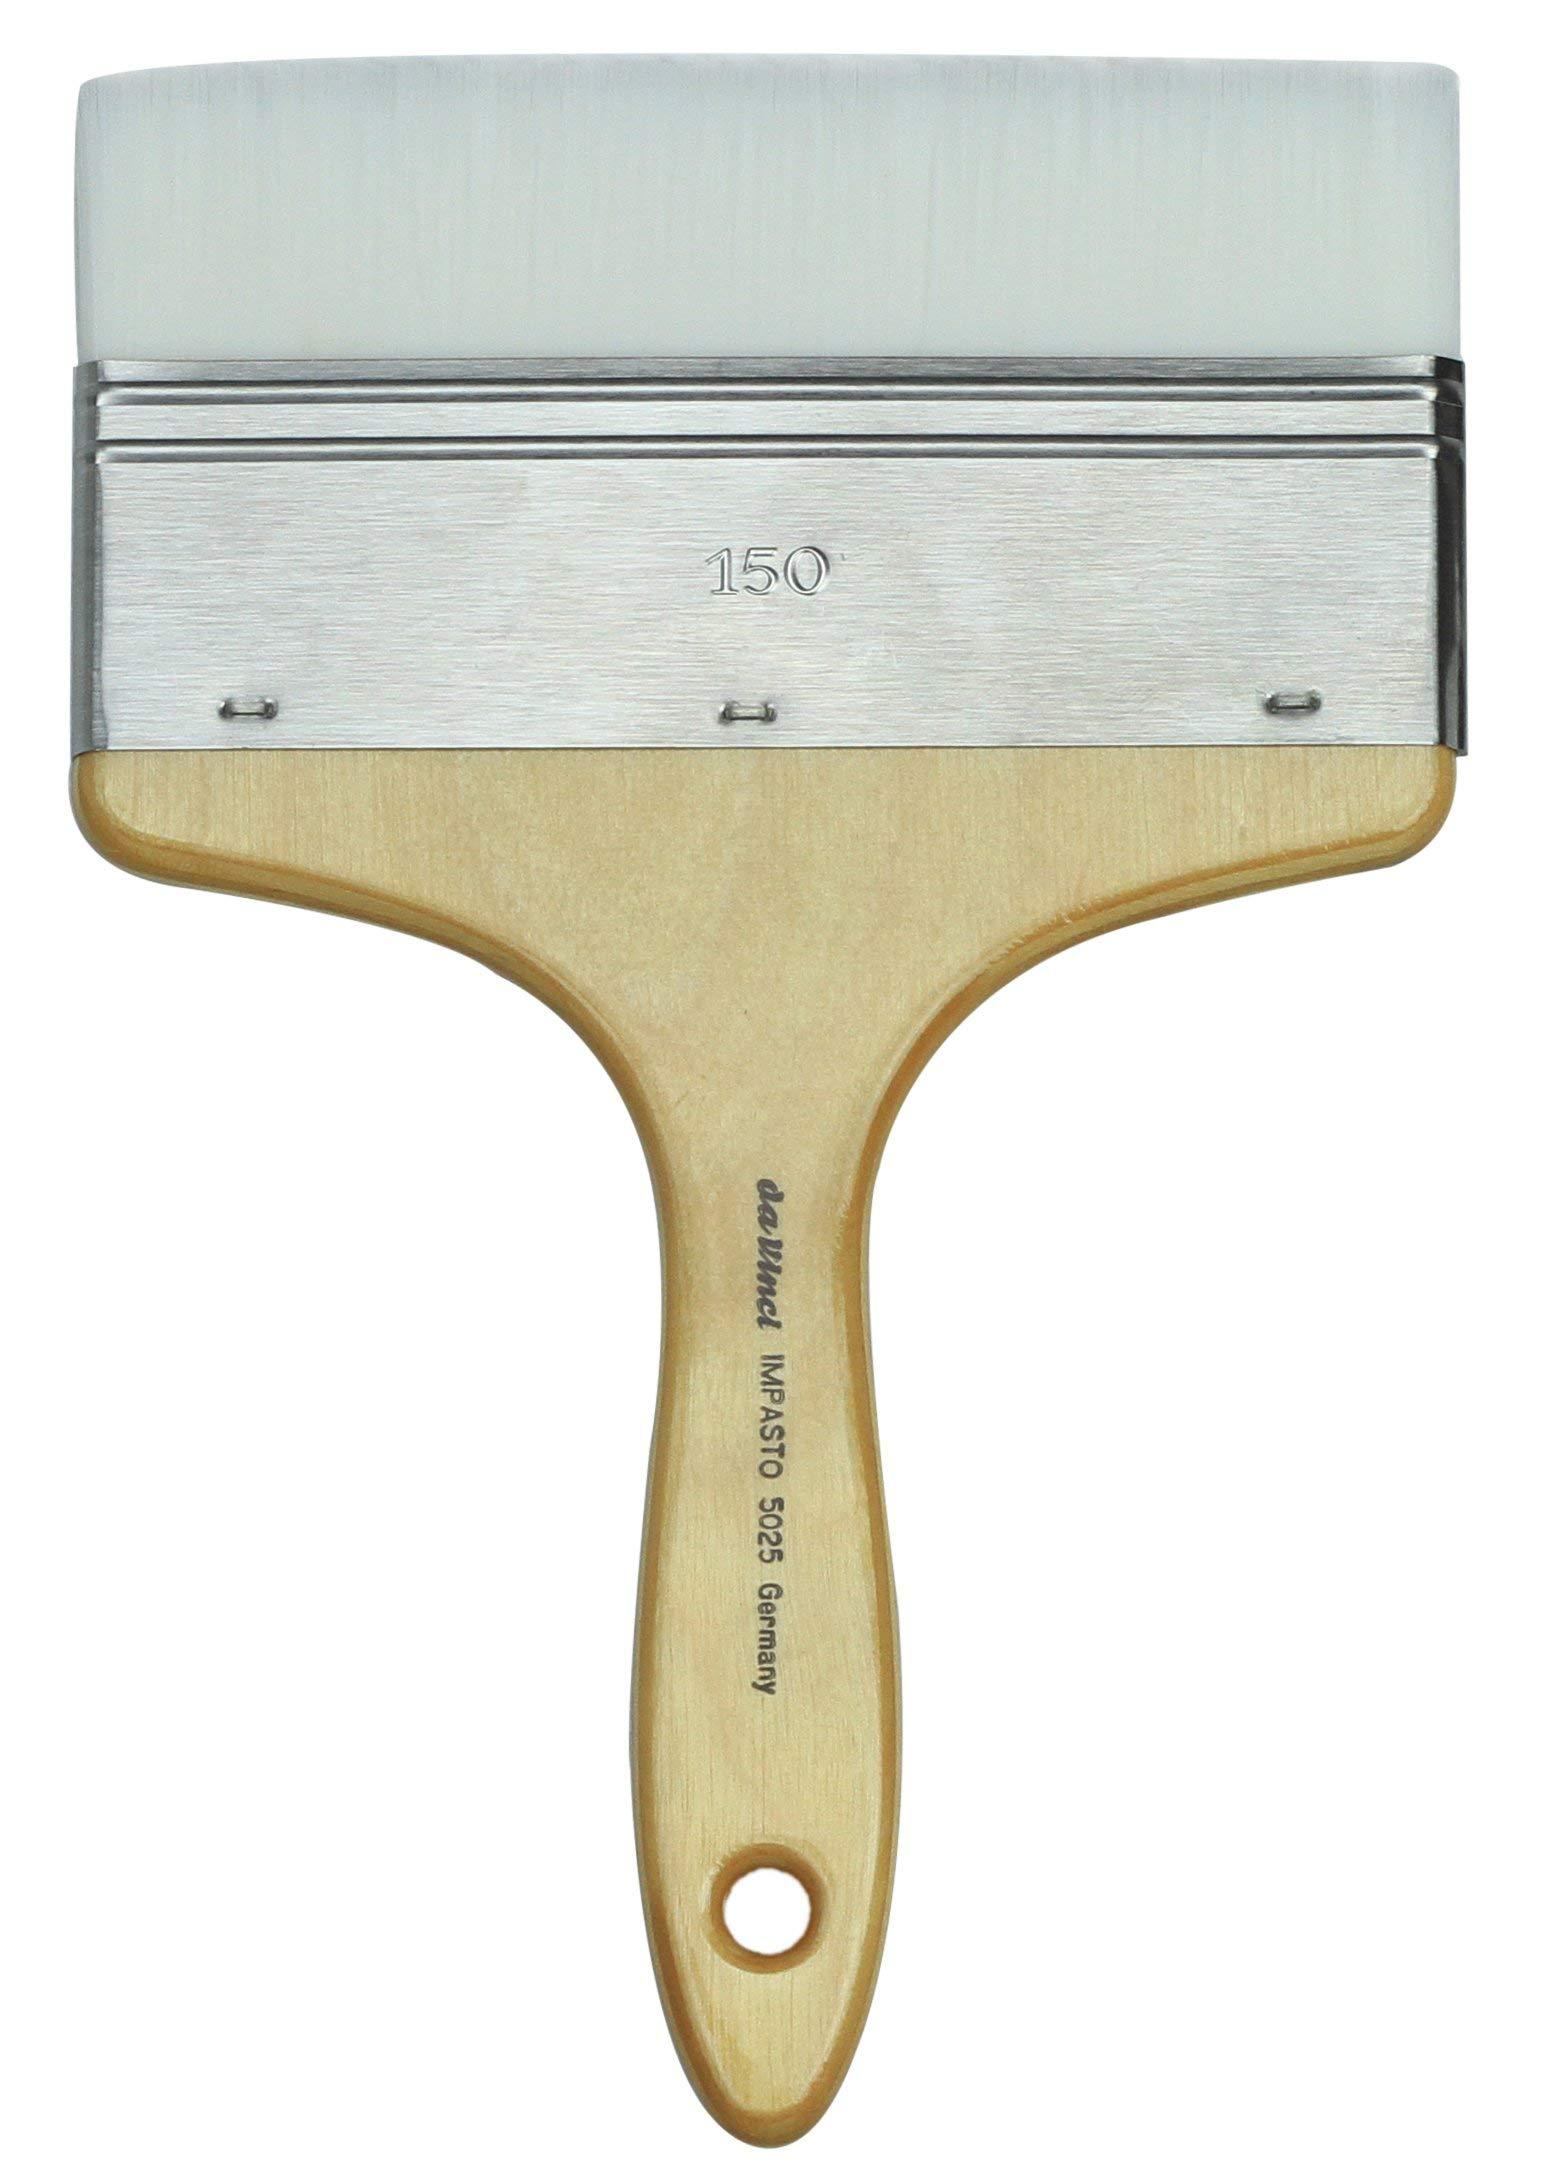 da Vinci Oil & Acrylic Series 5025 Impasto Paint Brush, Mottler Extra Stiff White Synthetic, Size 150